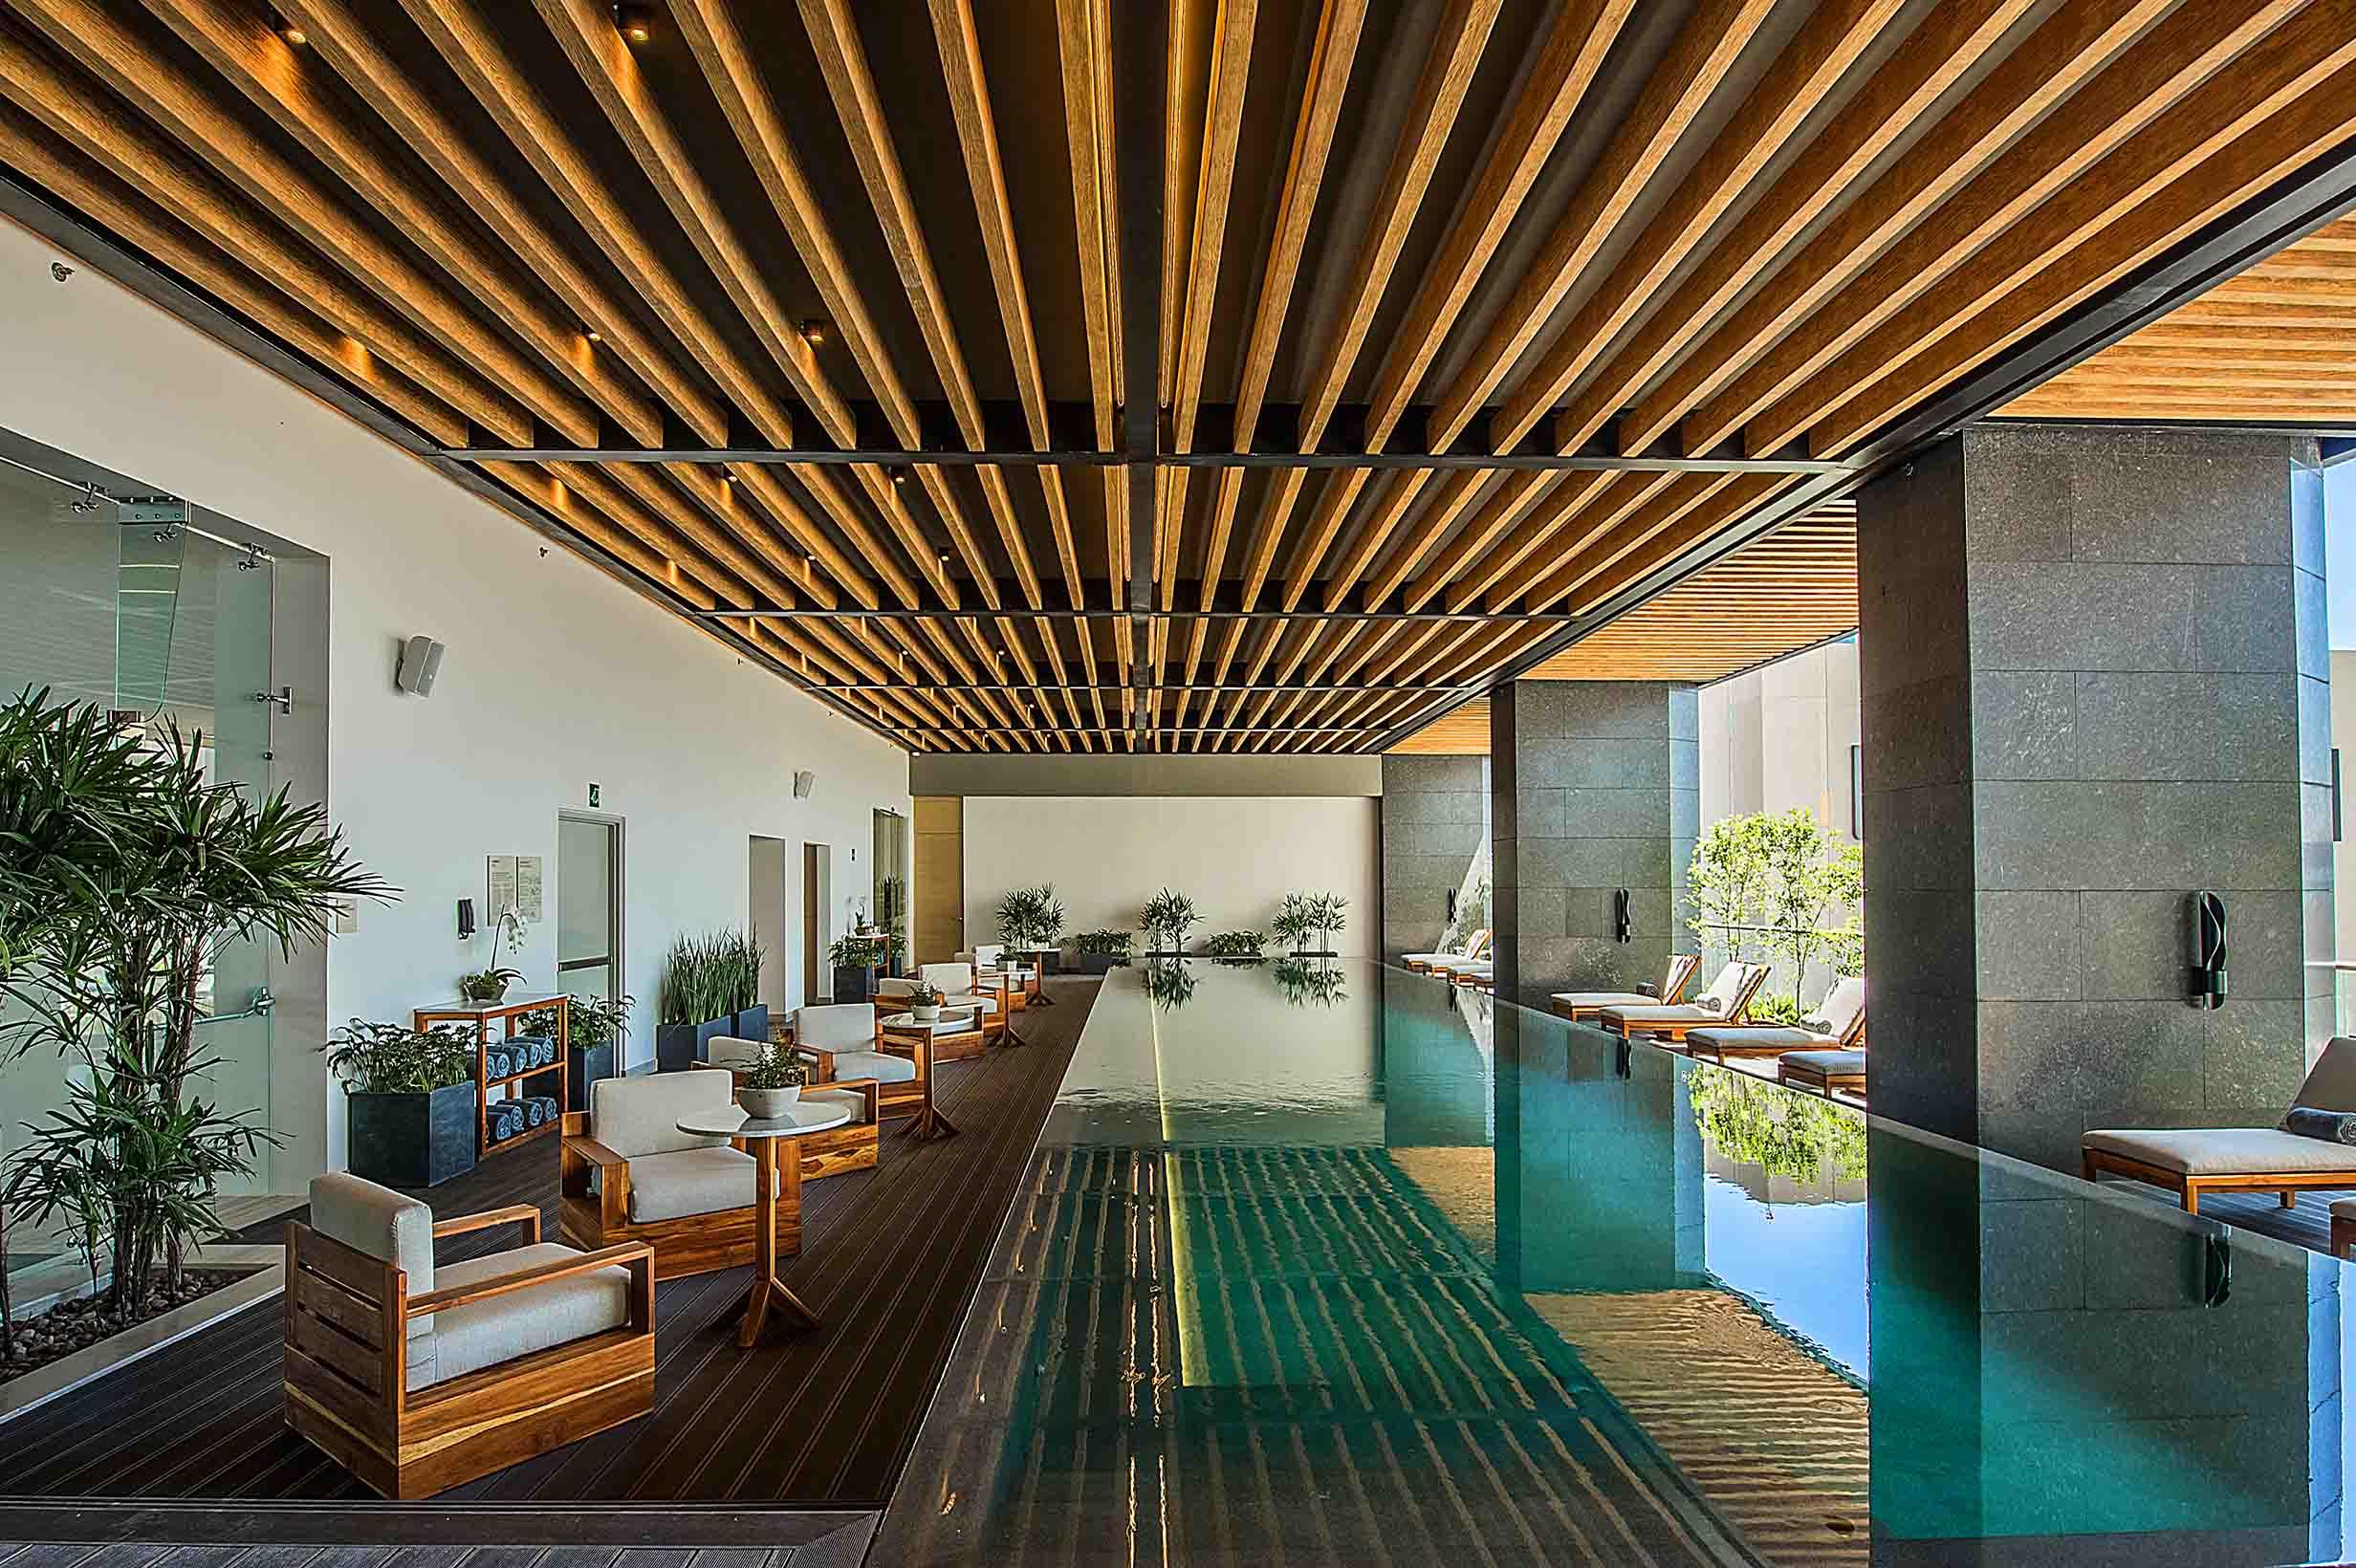 Interiores interiorismo dise o de interiores y m s for Arquitectura de interiores universidades